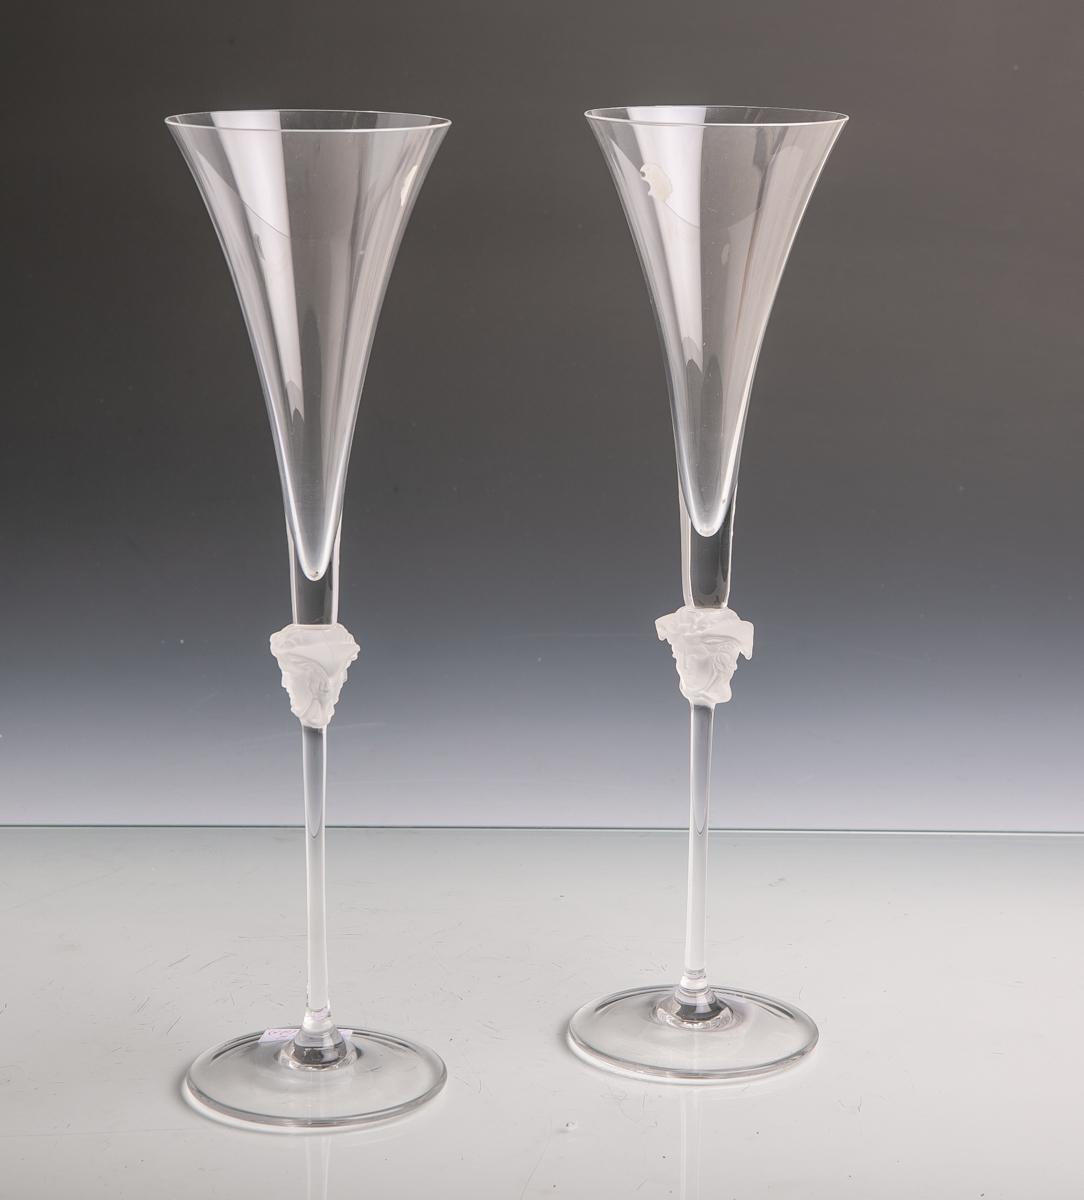 Lot 11 - Zwei Sektgläser/Sektflöten (Rosenthal, Versace, Medusa Lumière, 20. Jahrhundert), am GriffMedusakopf